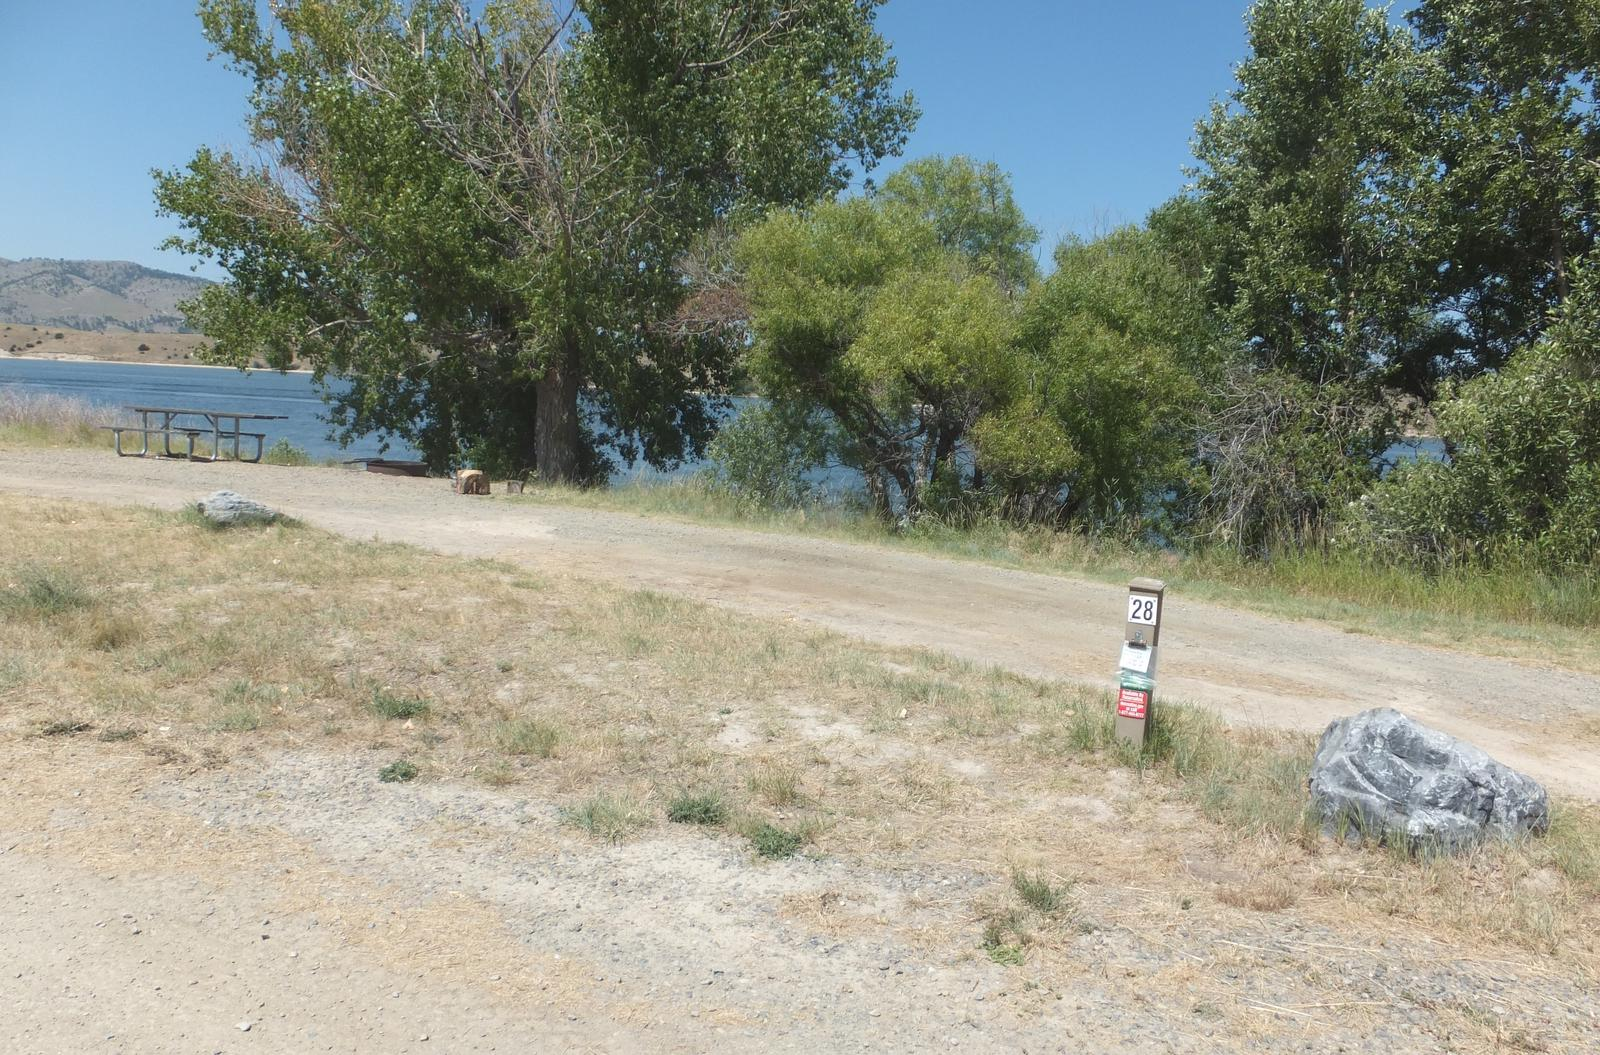 Hellgate Campground - Campsite 28